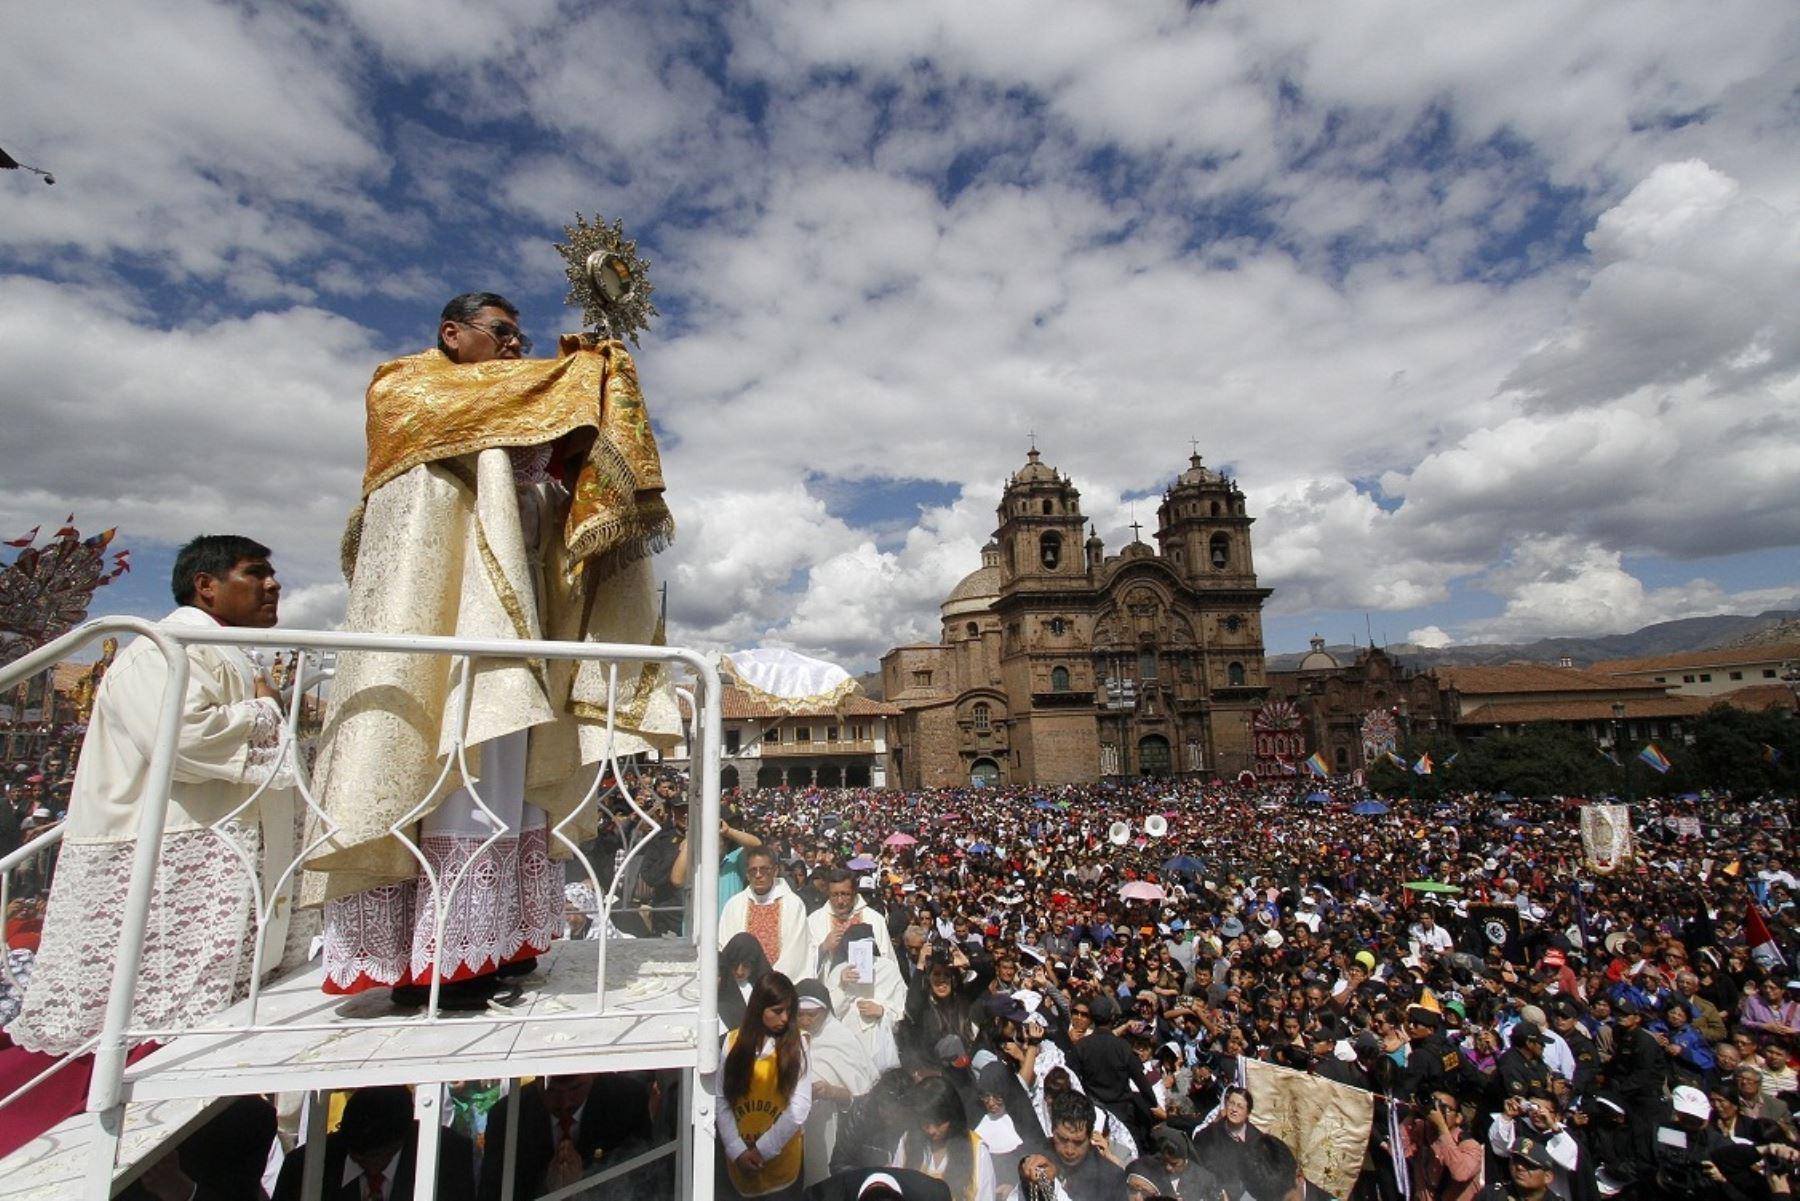 La pandemia de coronavirus obliga a Cusco a suspender tradicional ceremonia del Corpus Christi. ANDINA/Percy Hurtado Santillán